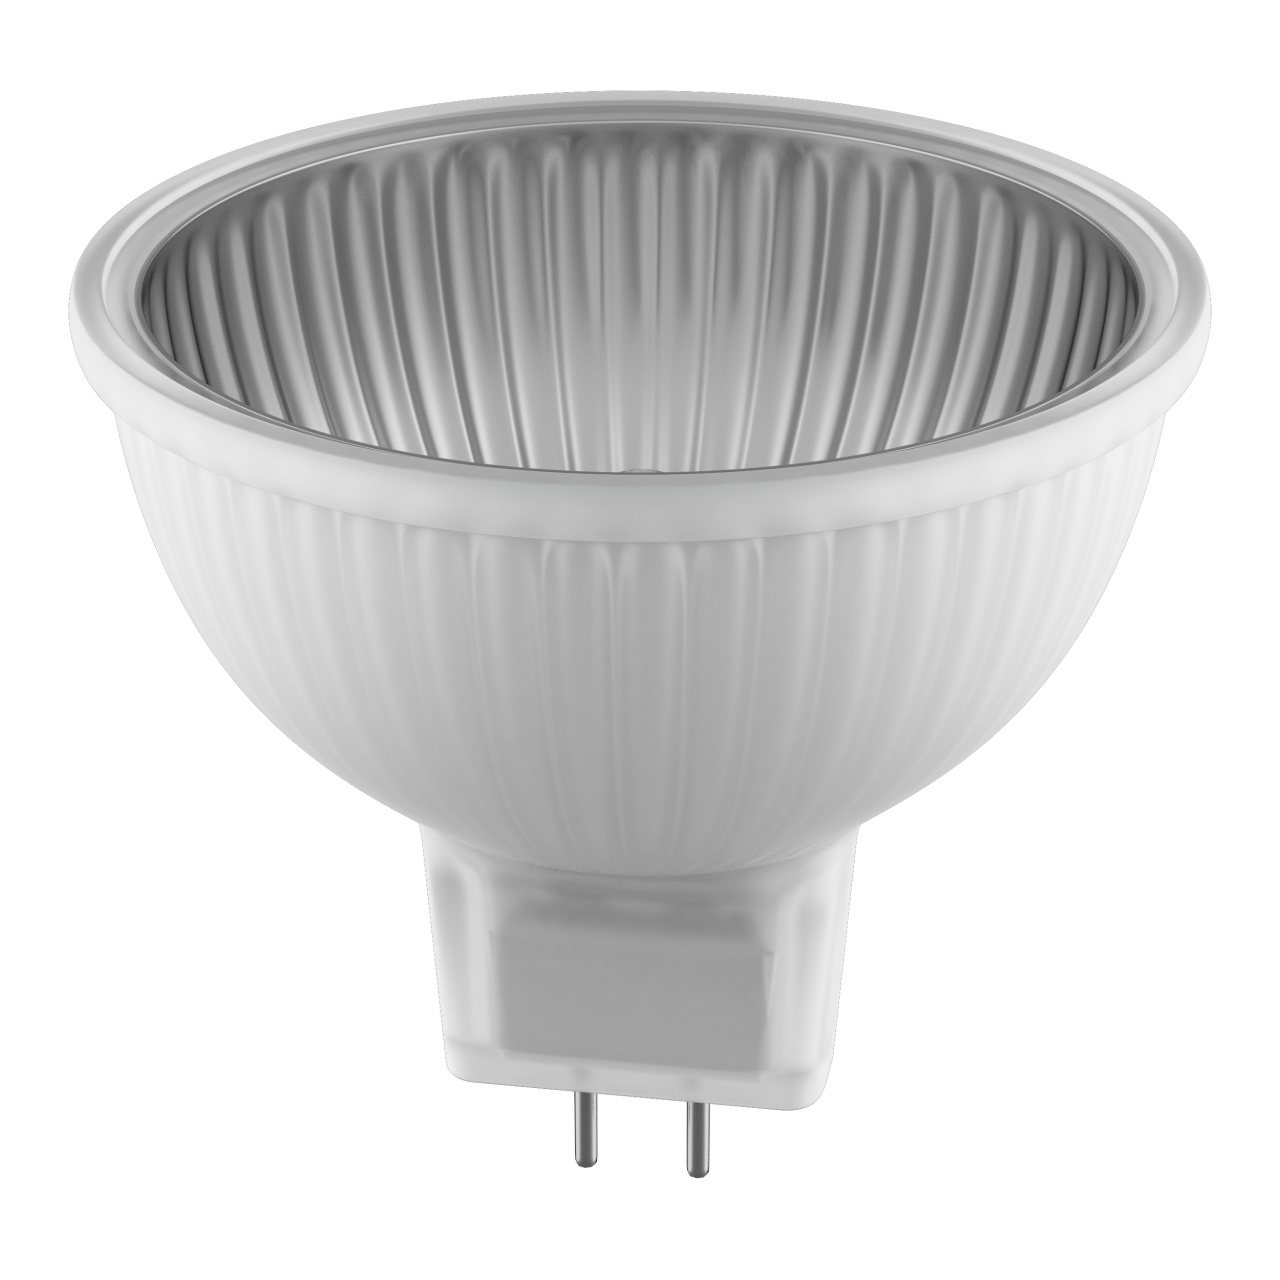 Лампа HAL 12V MR16 G5.3 35W 60G ALU RA100 2800K 2000H DIMM Lightstar 921705